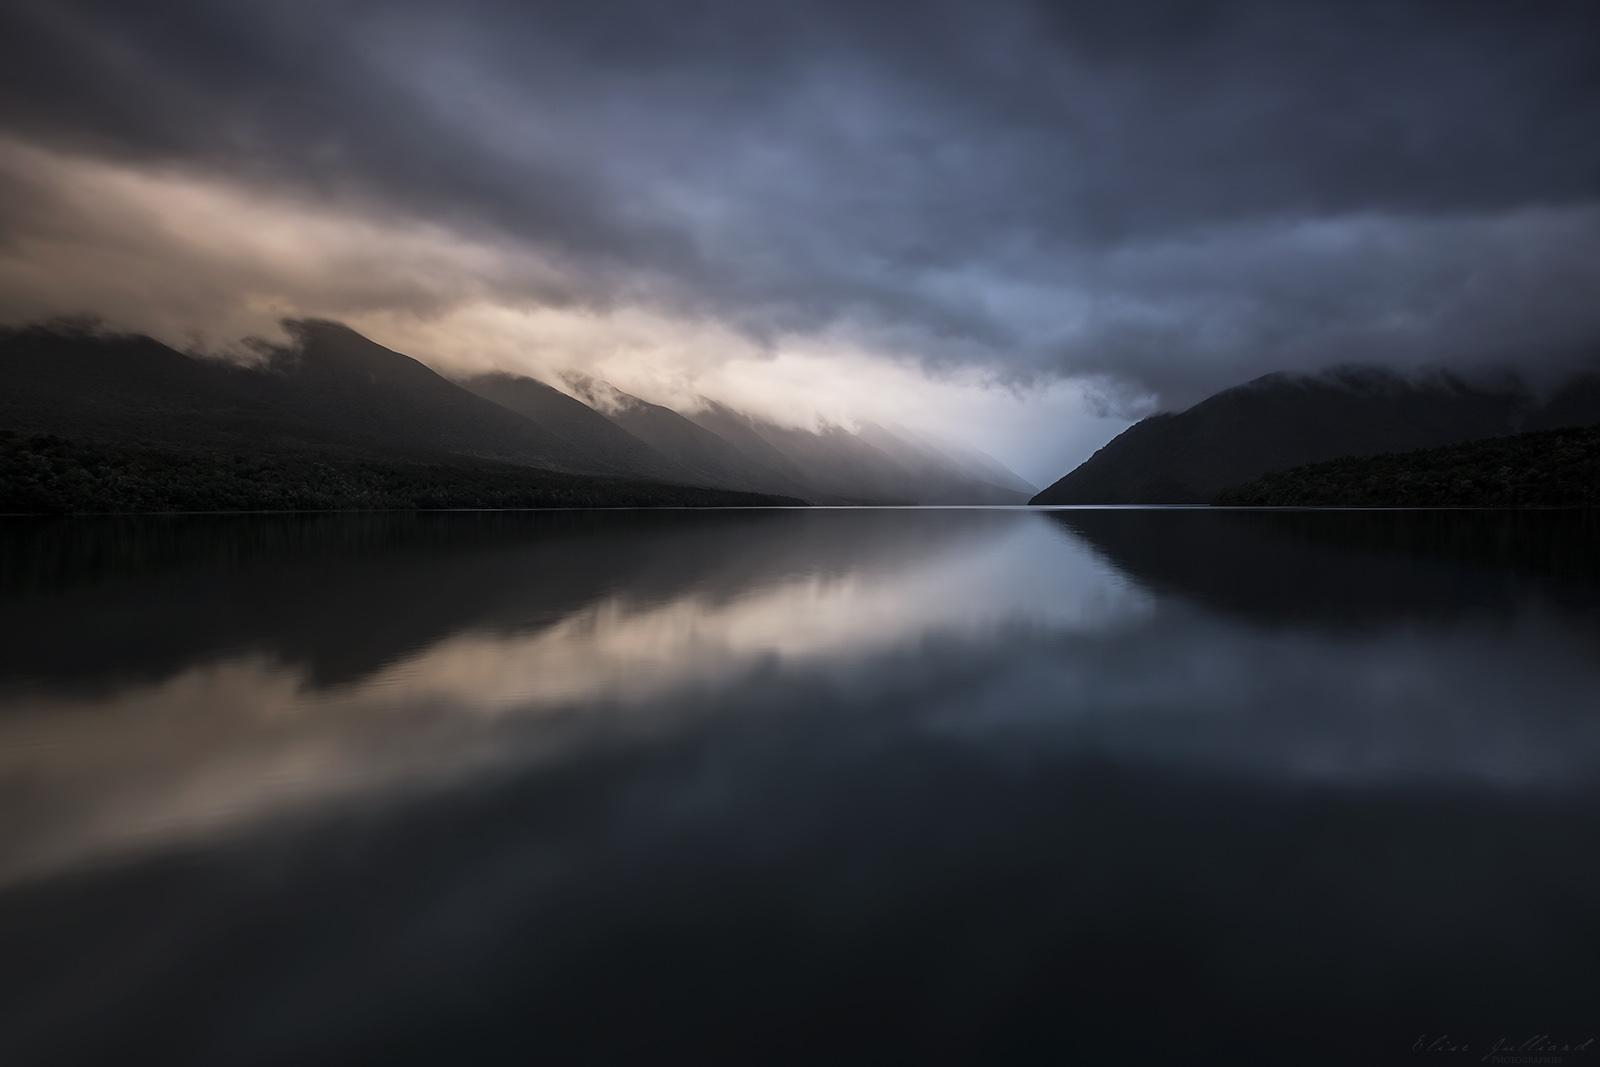 lake-rotoiti-lac-mountain-montagne-tasman-nelson-lakes-national-park-saint-arnaud-new-zealand-nouvelle-zelande-south-island-ile-sud-travel-voyage-canterbury